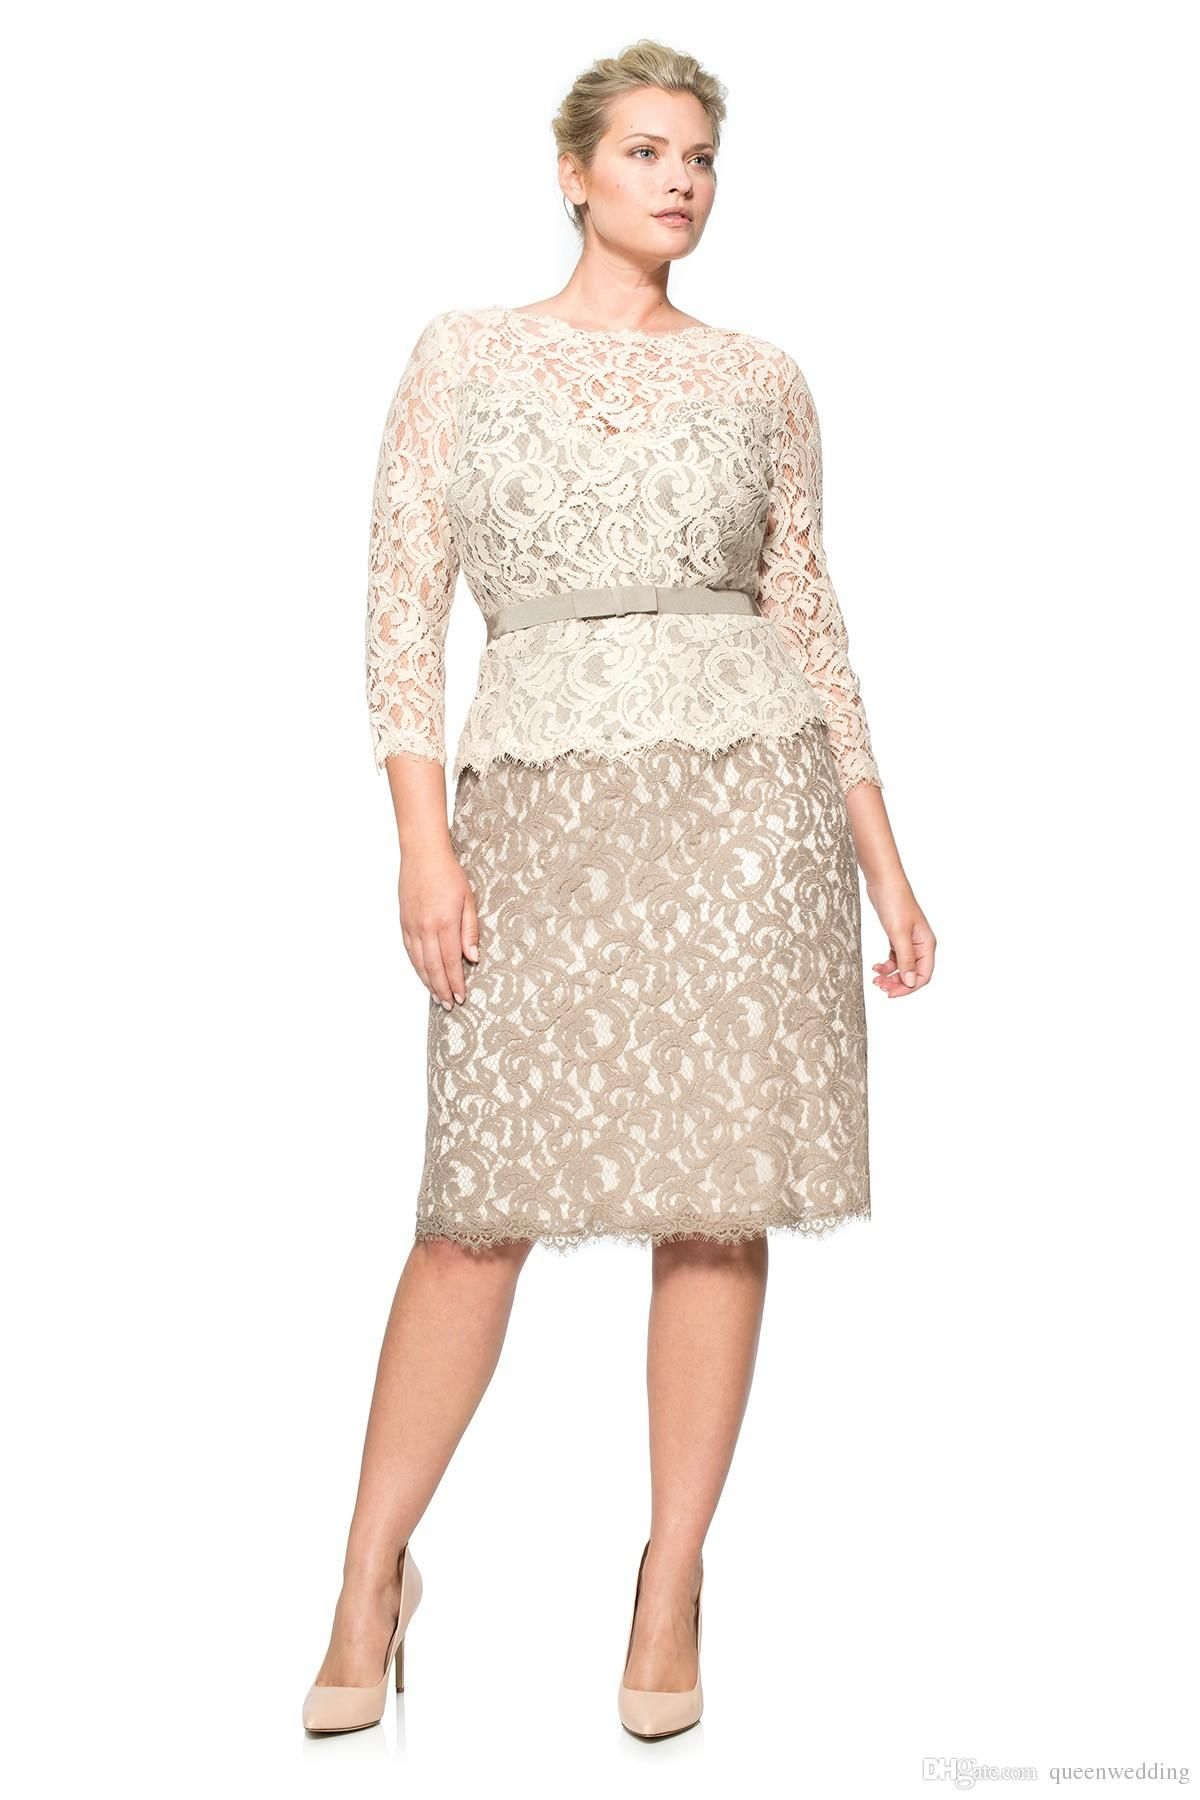 Cheap Elegant 2015 Mother The Bride Dresses See Through